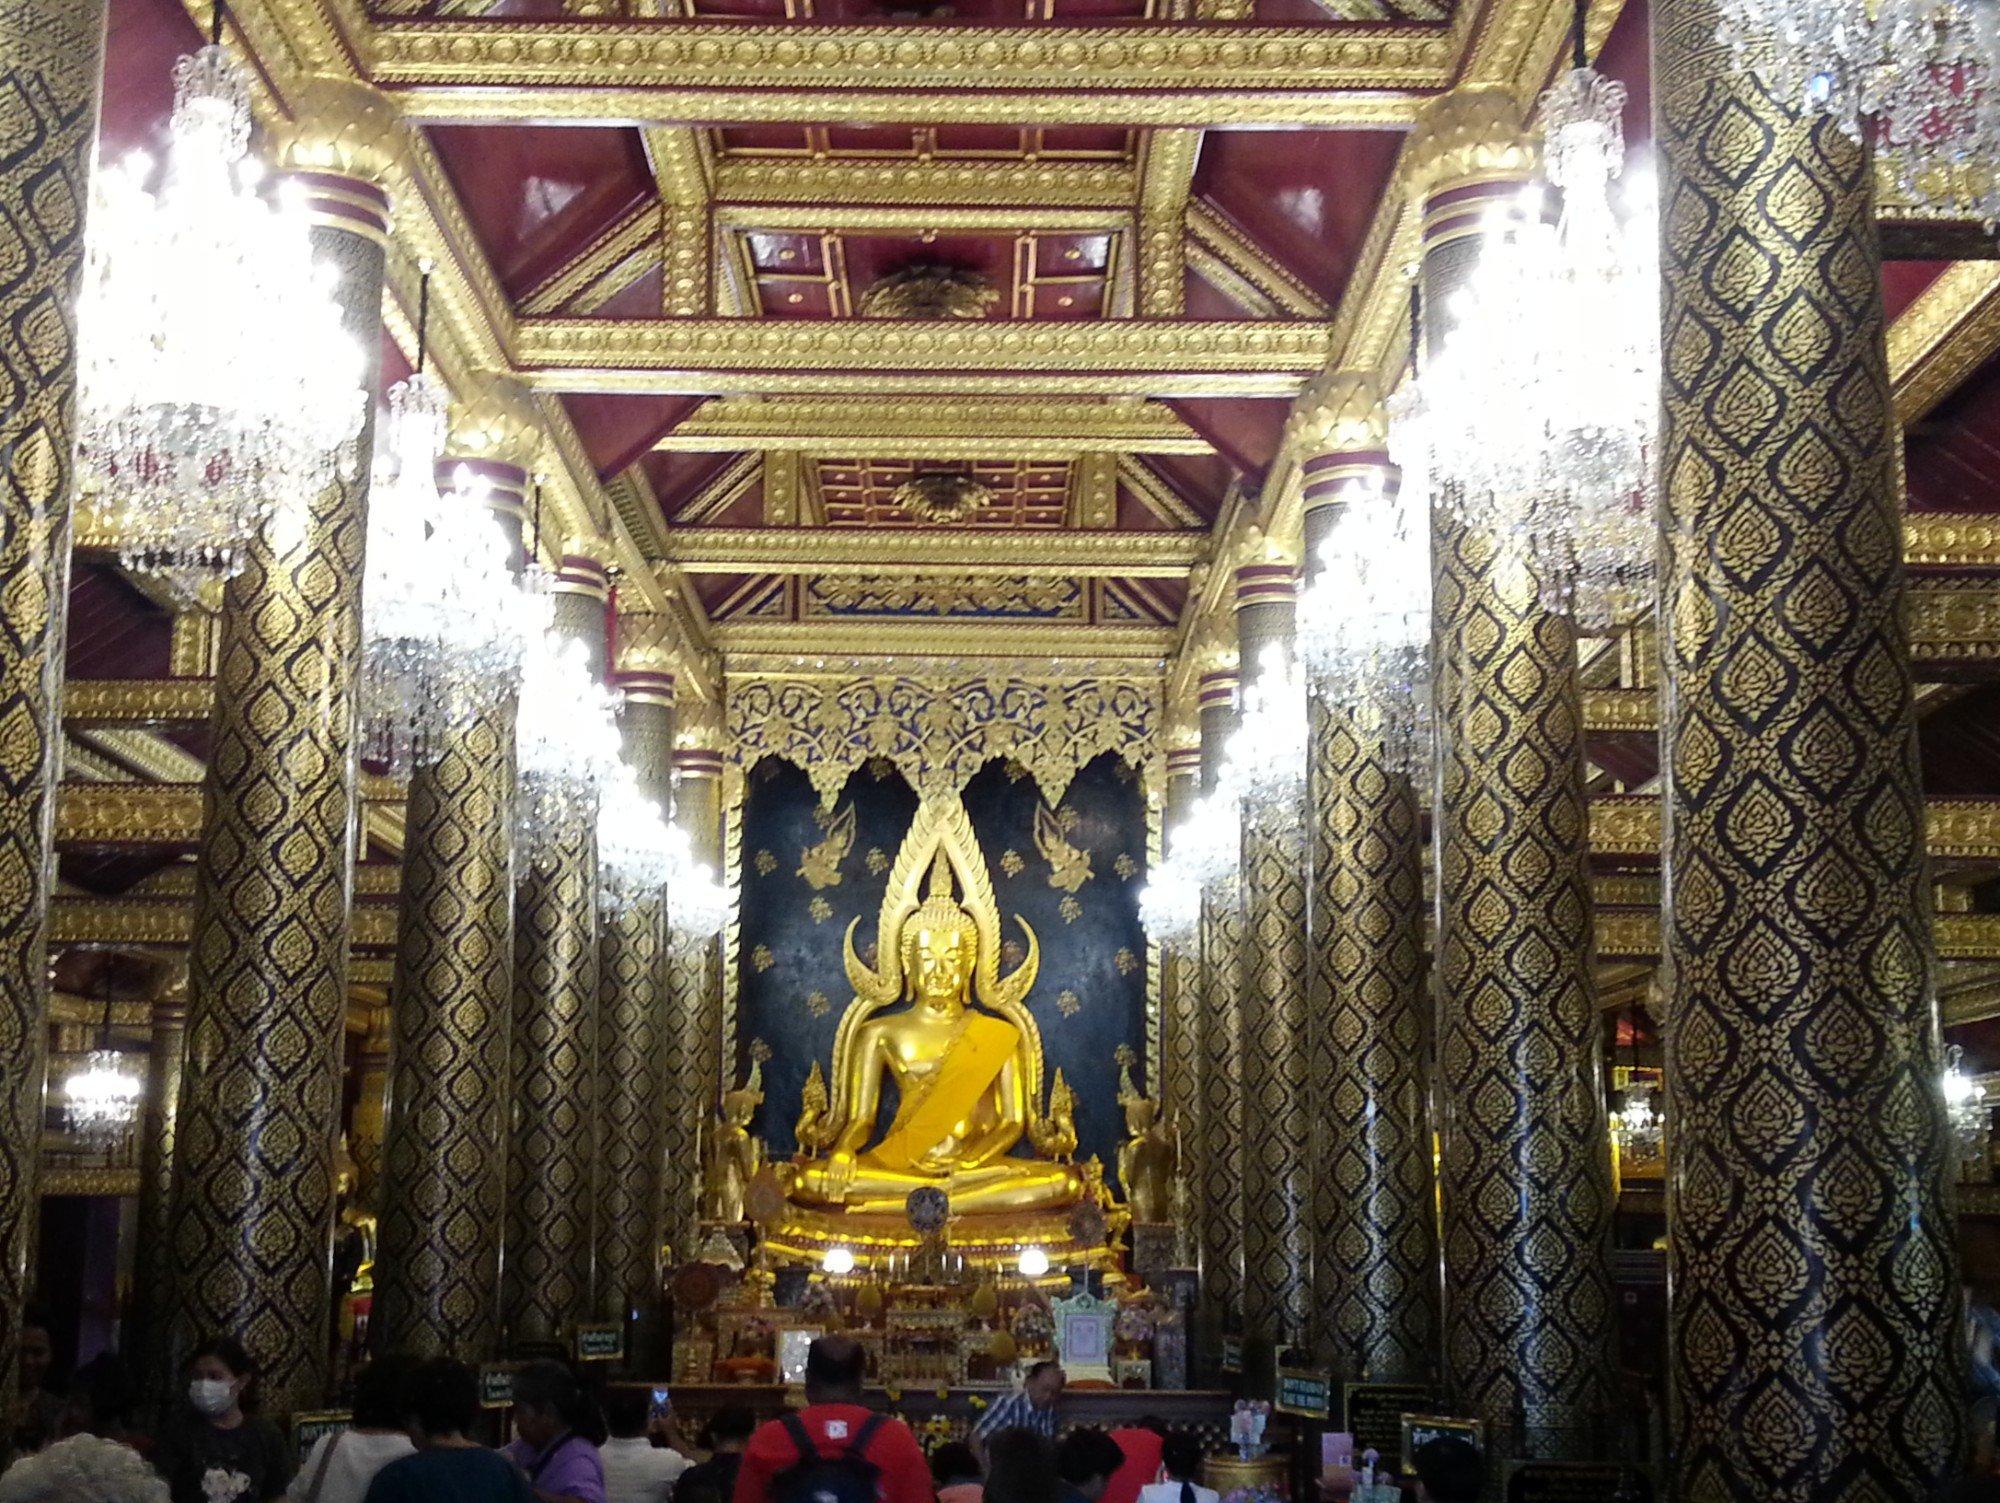 Phra Buddha Chinnarat statue at Wat Phra Si Rattana Mahathat